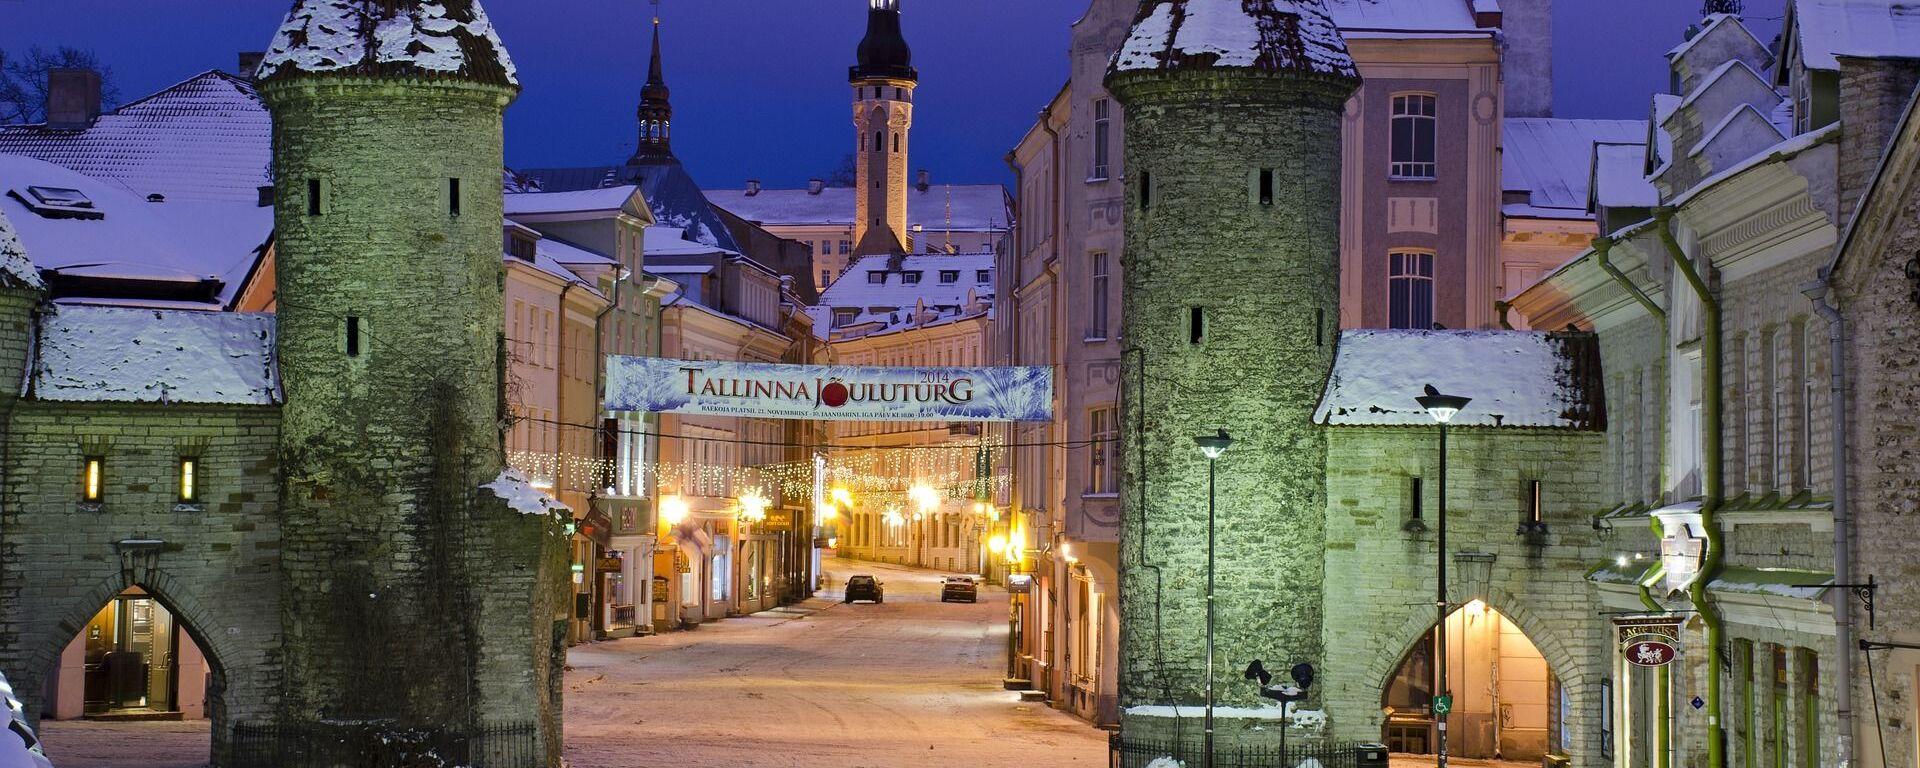 Вид на ночной Таллин, Эстония - Sputnik Латвия, 1920, 18.12.2020